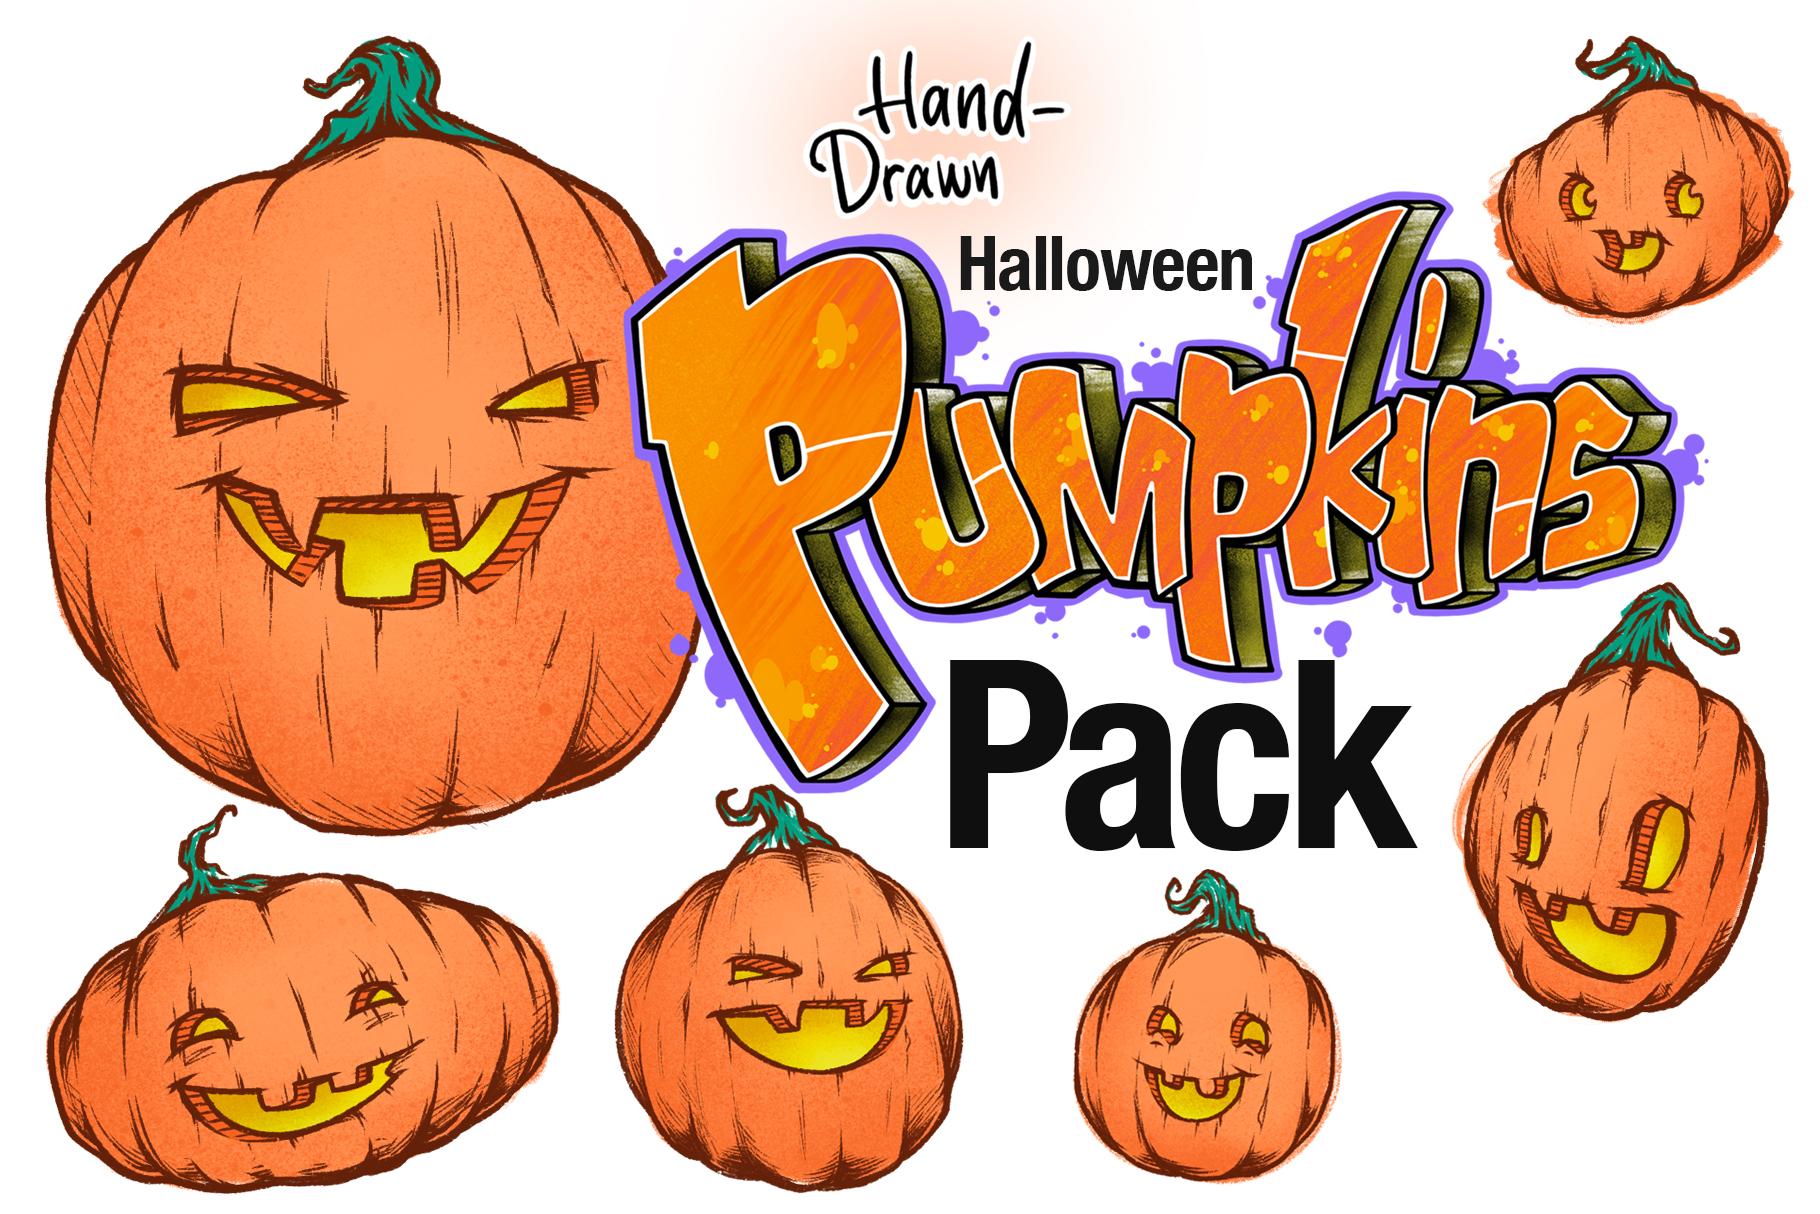 Illustrated Pumpkins Pack